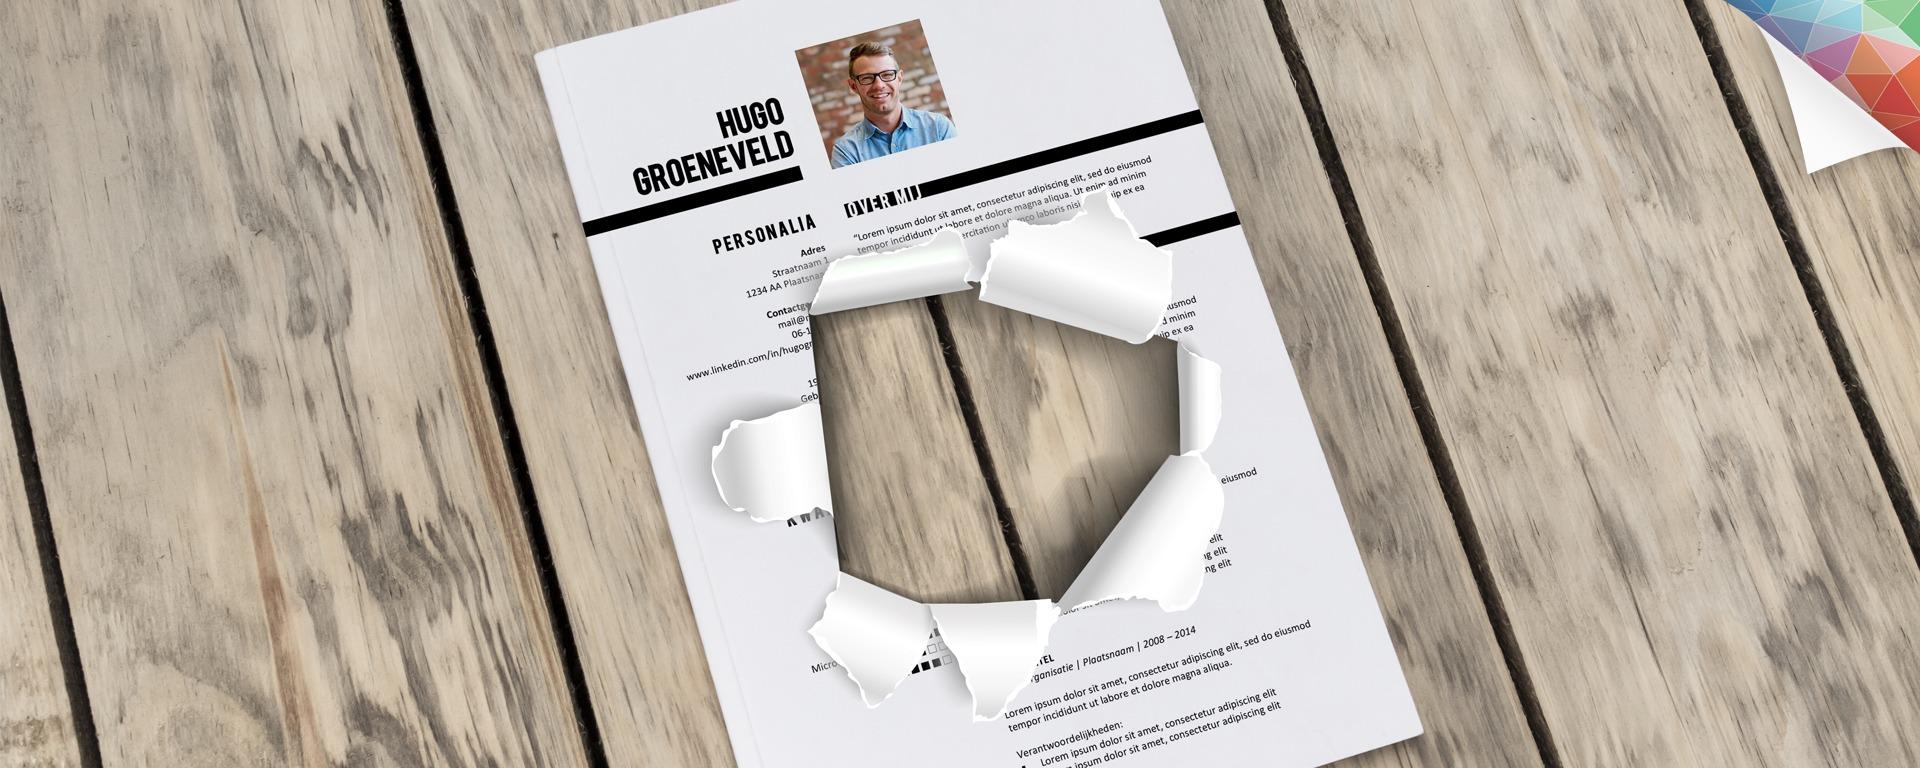 Gat in je CV, hoe ga je daarmee om? | Creatief CV.nl